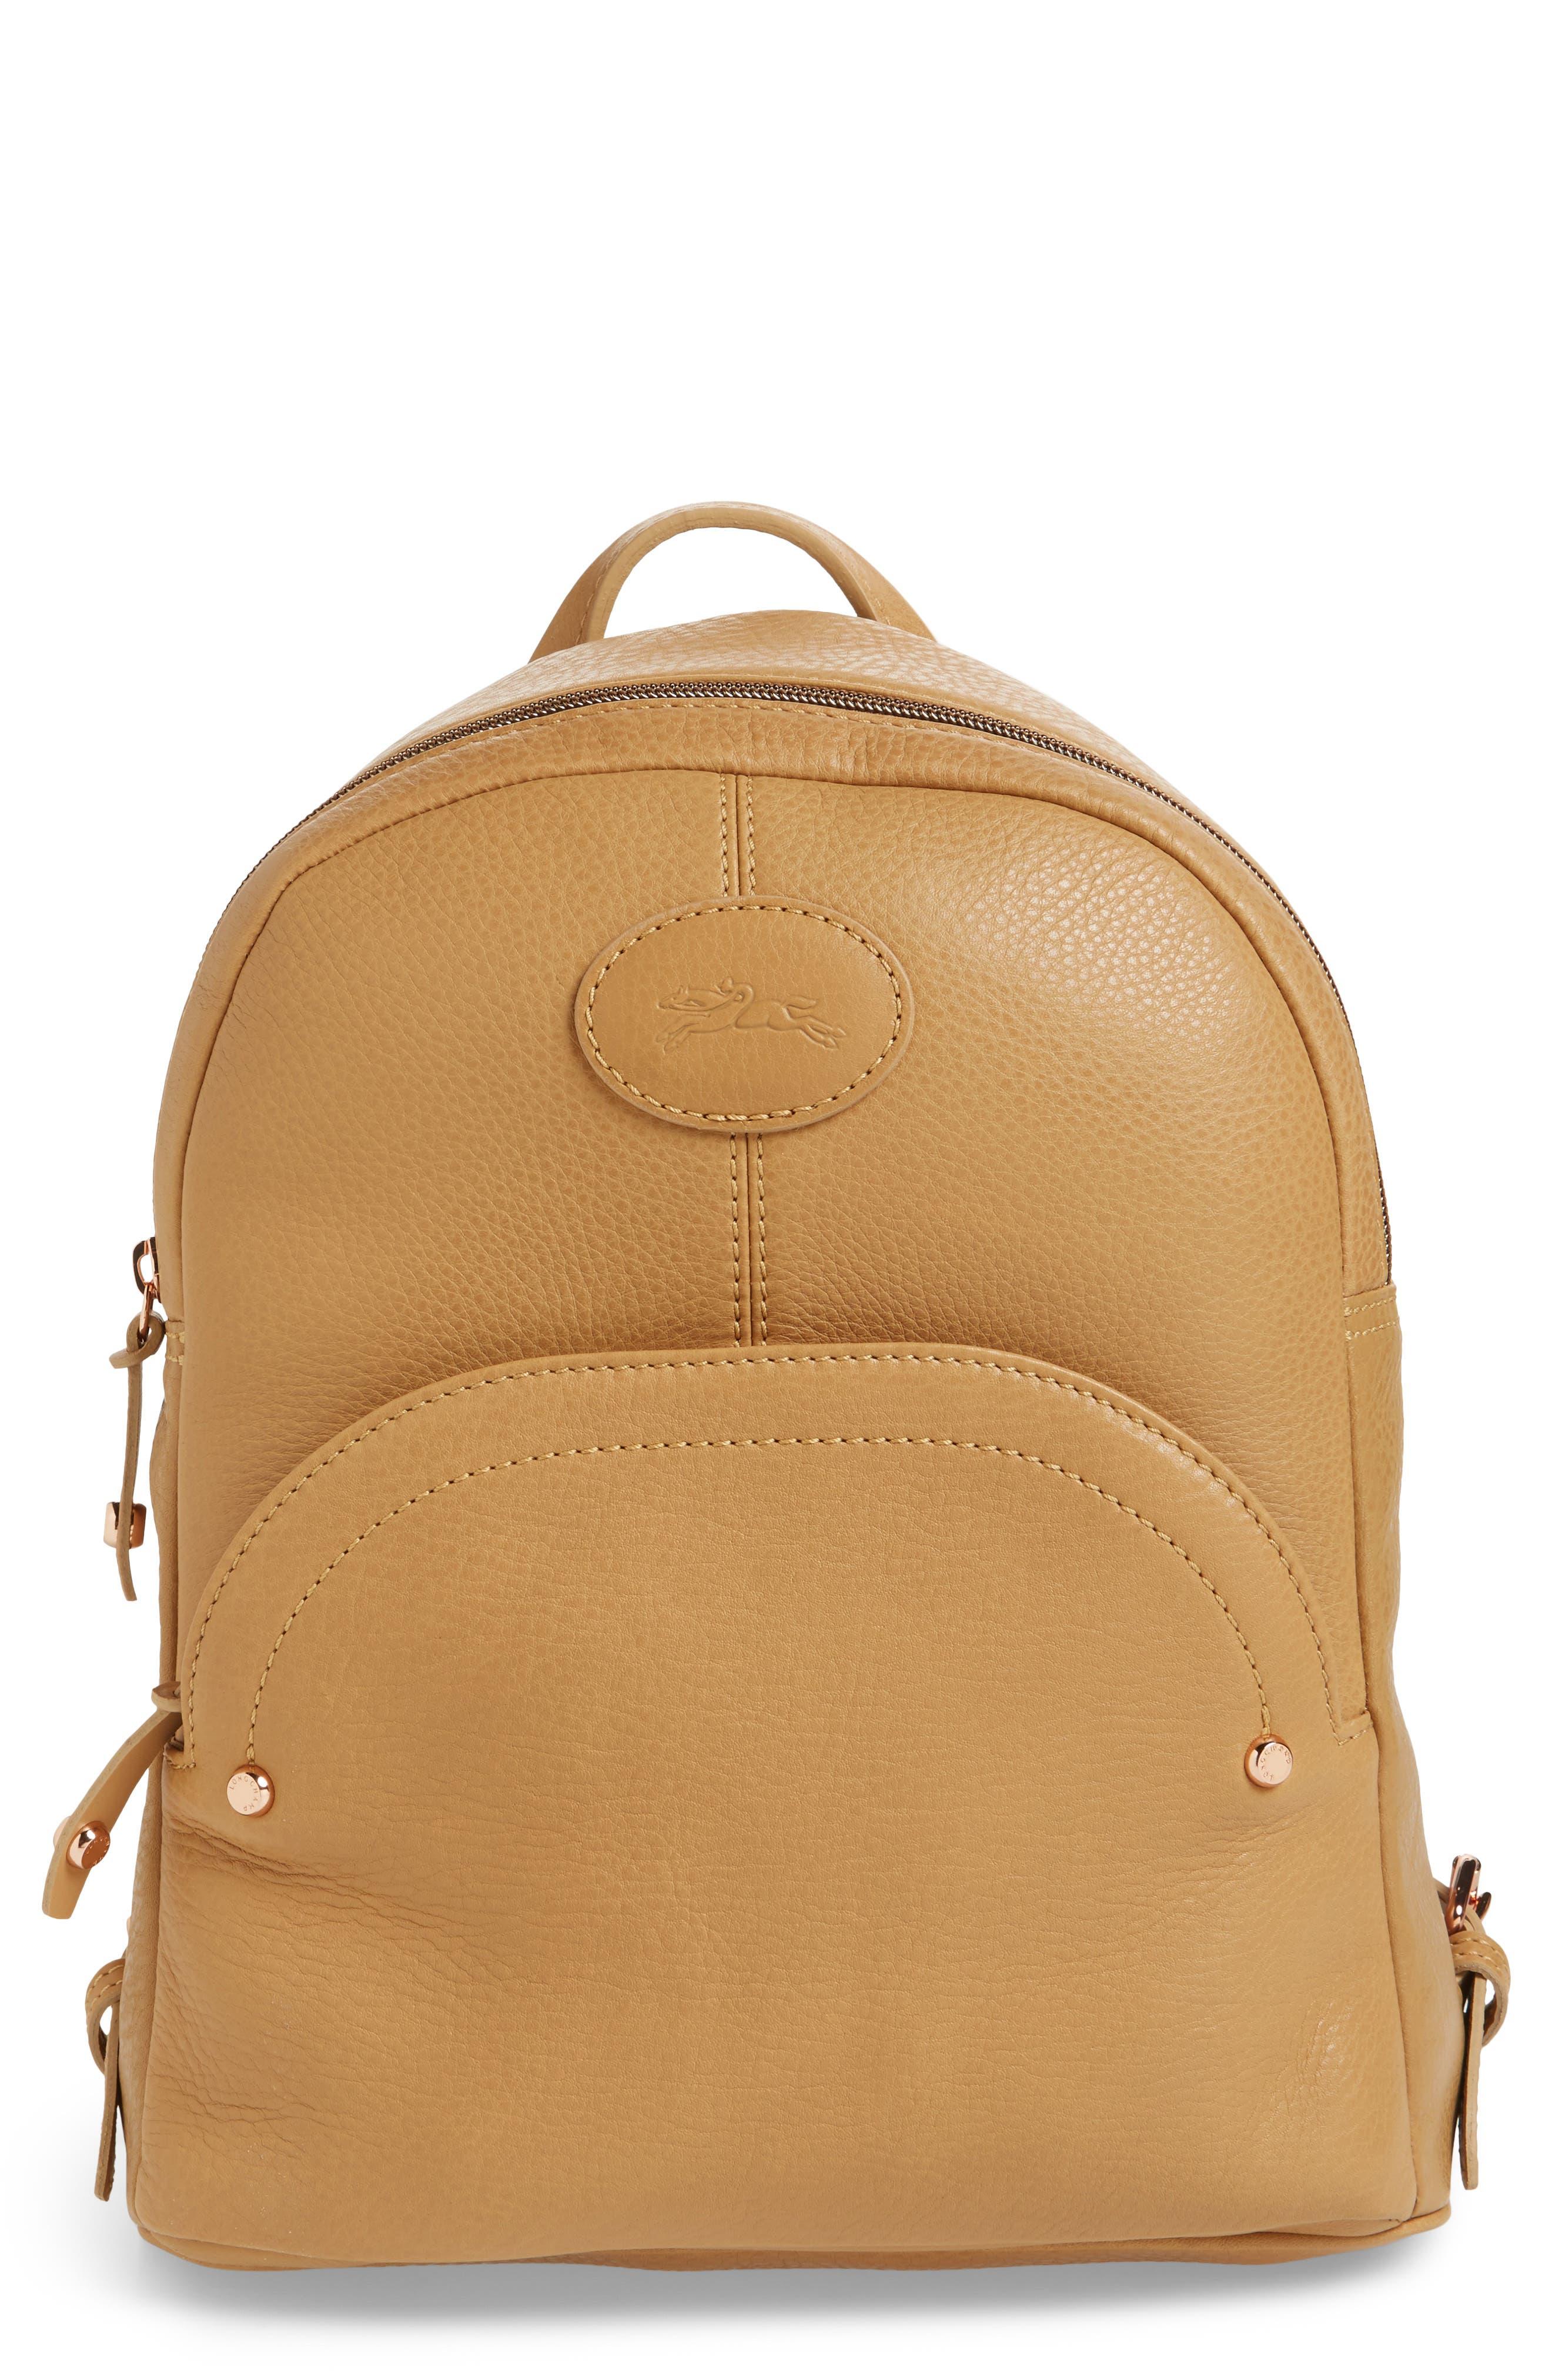 Longchamp Bags | Nordstrom